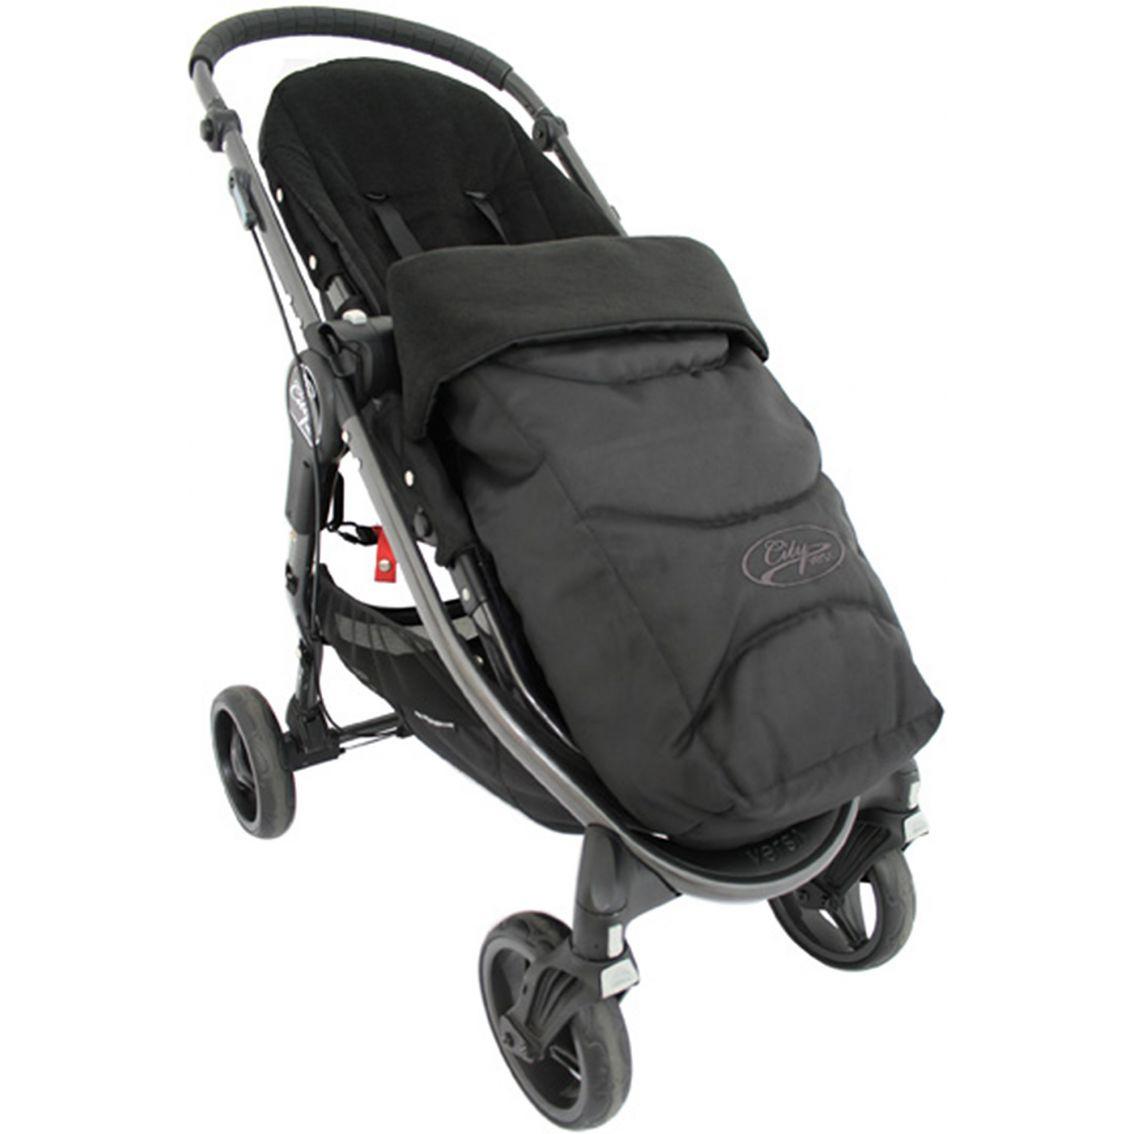 Baby Jogger City Versa Footmuff Black